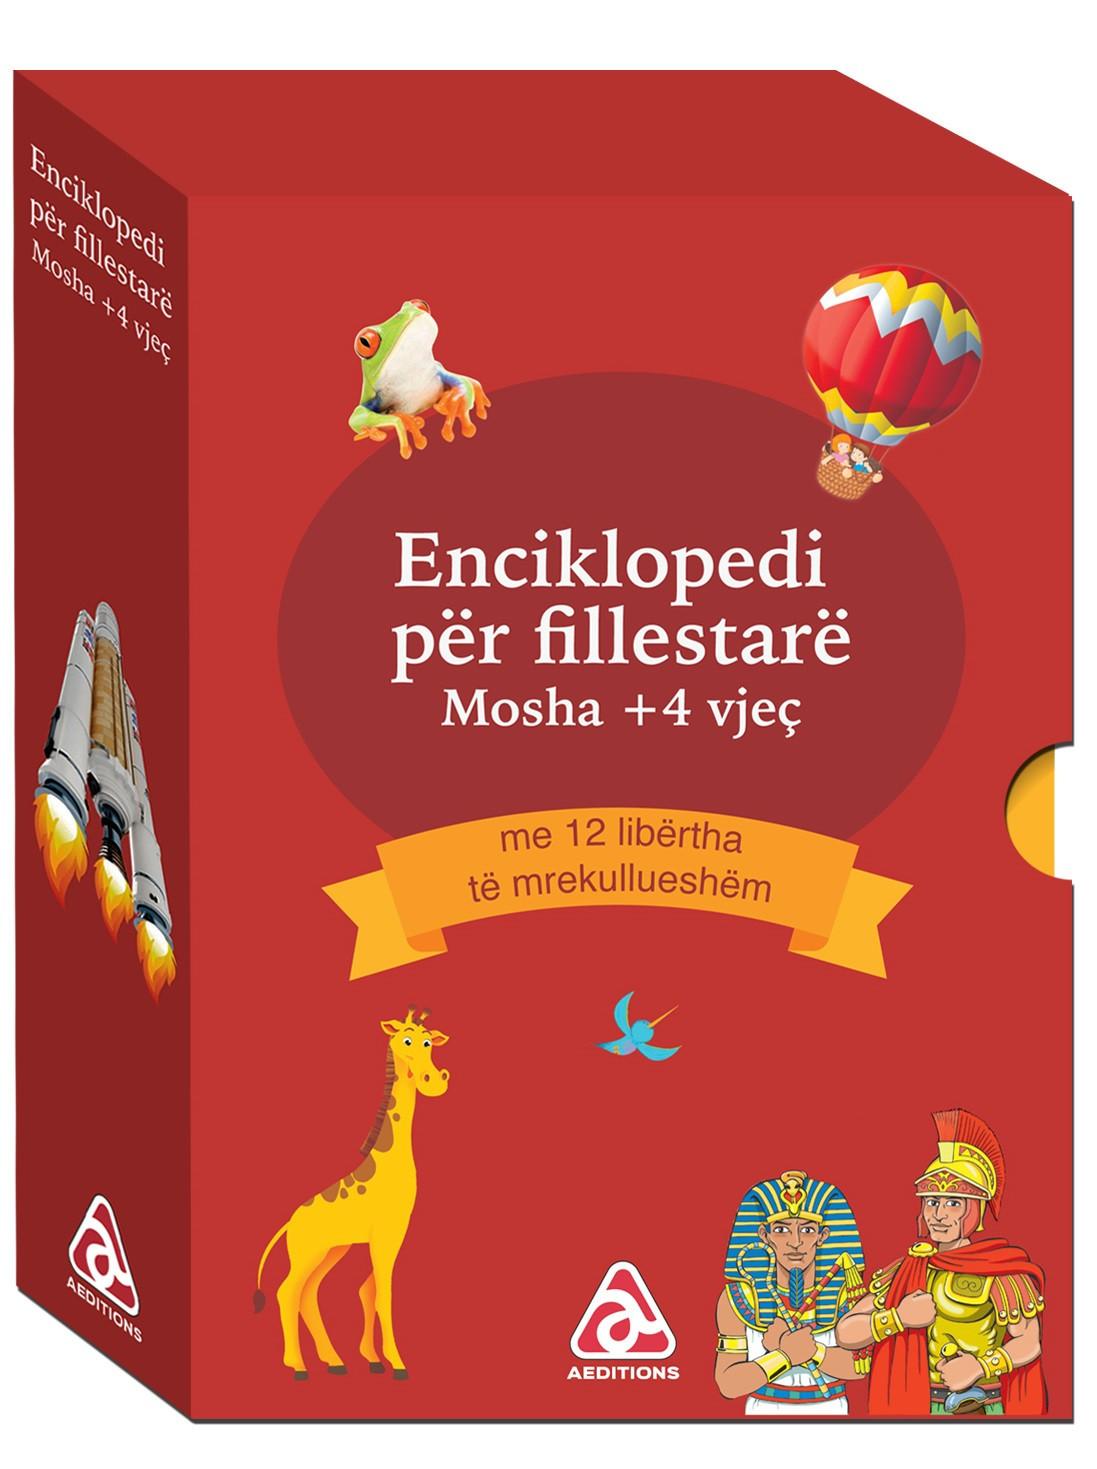 Enciklopedi per fillestare